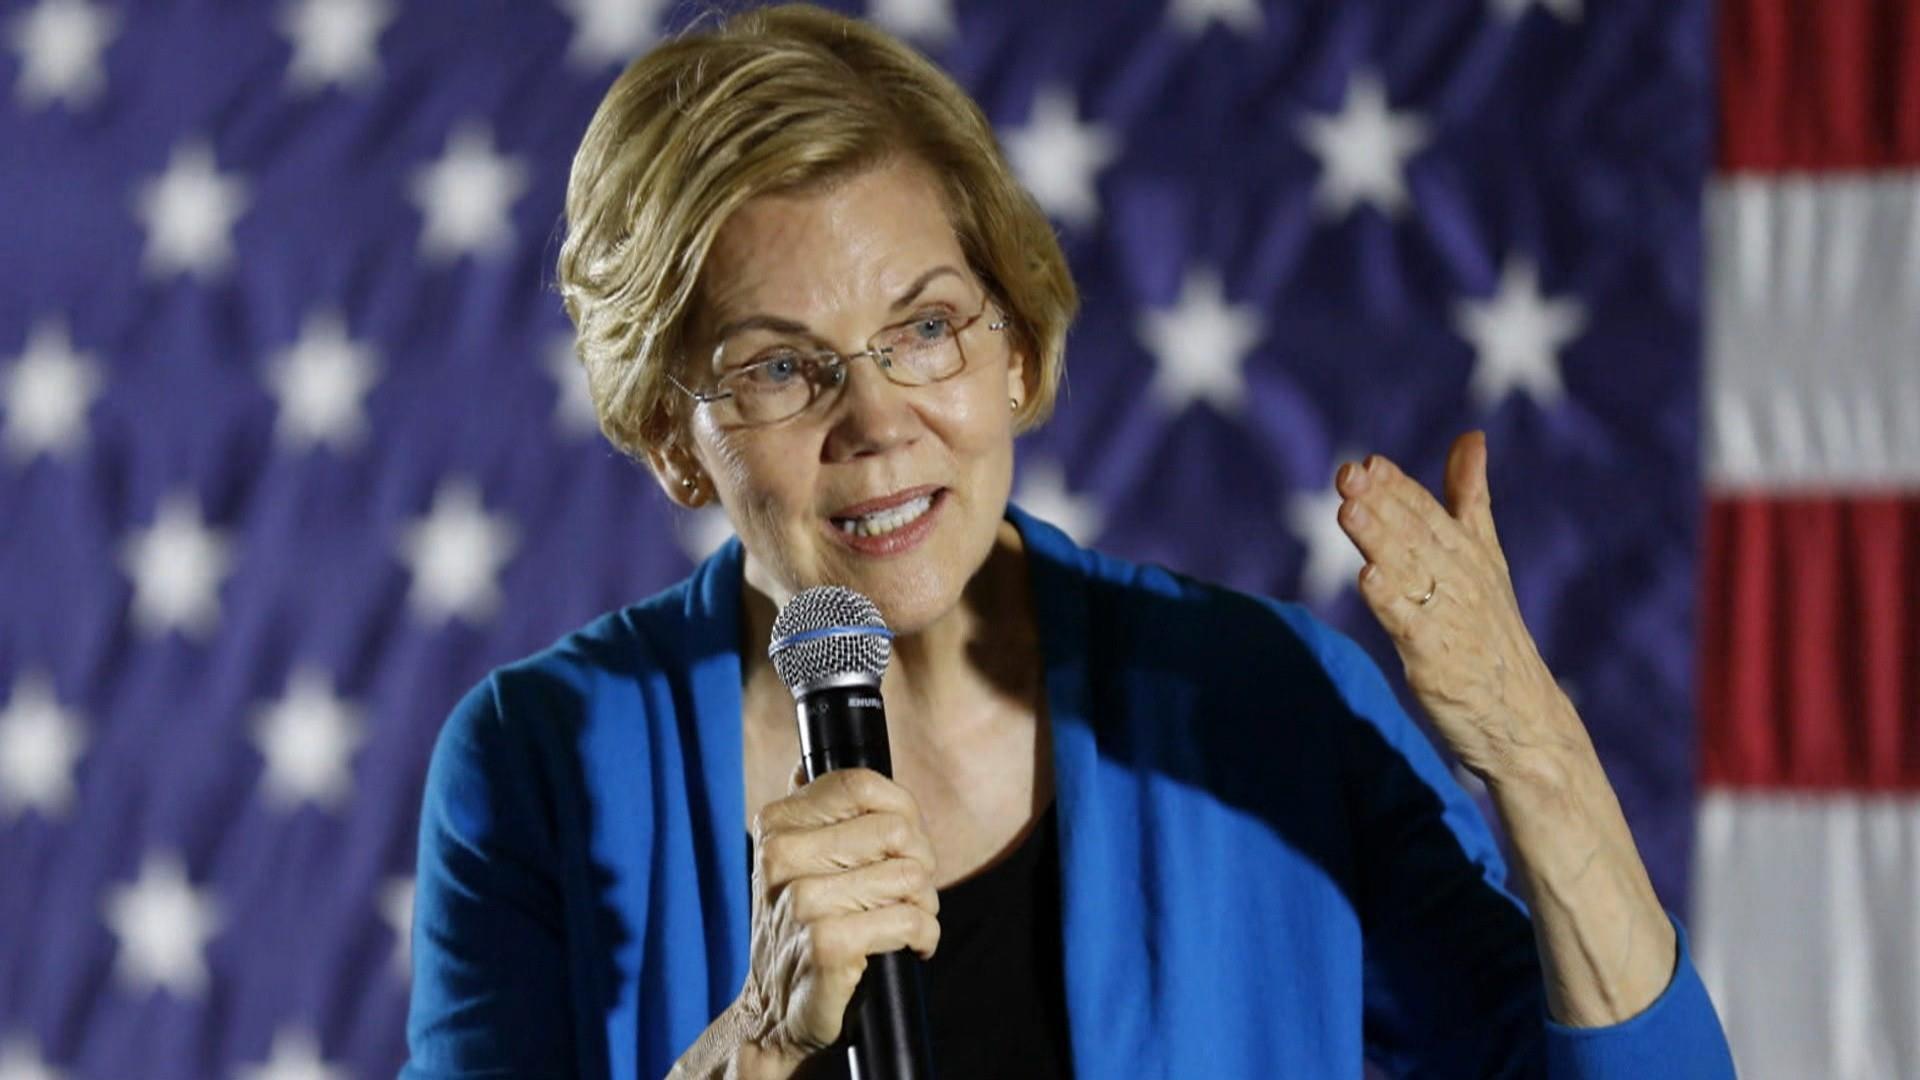 Democratic candidates prepare ahead of 1st debate